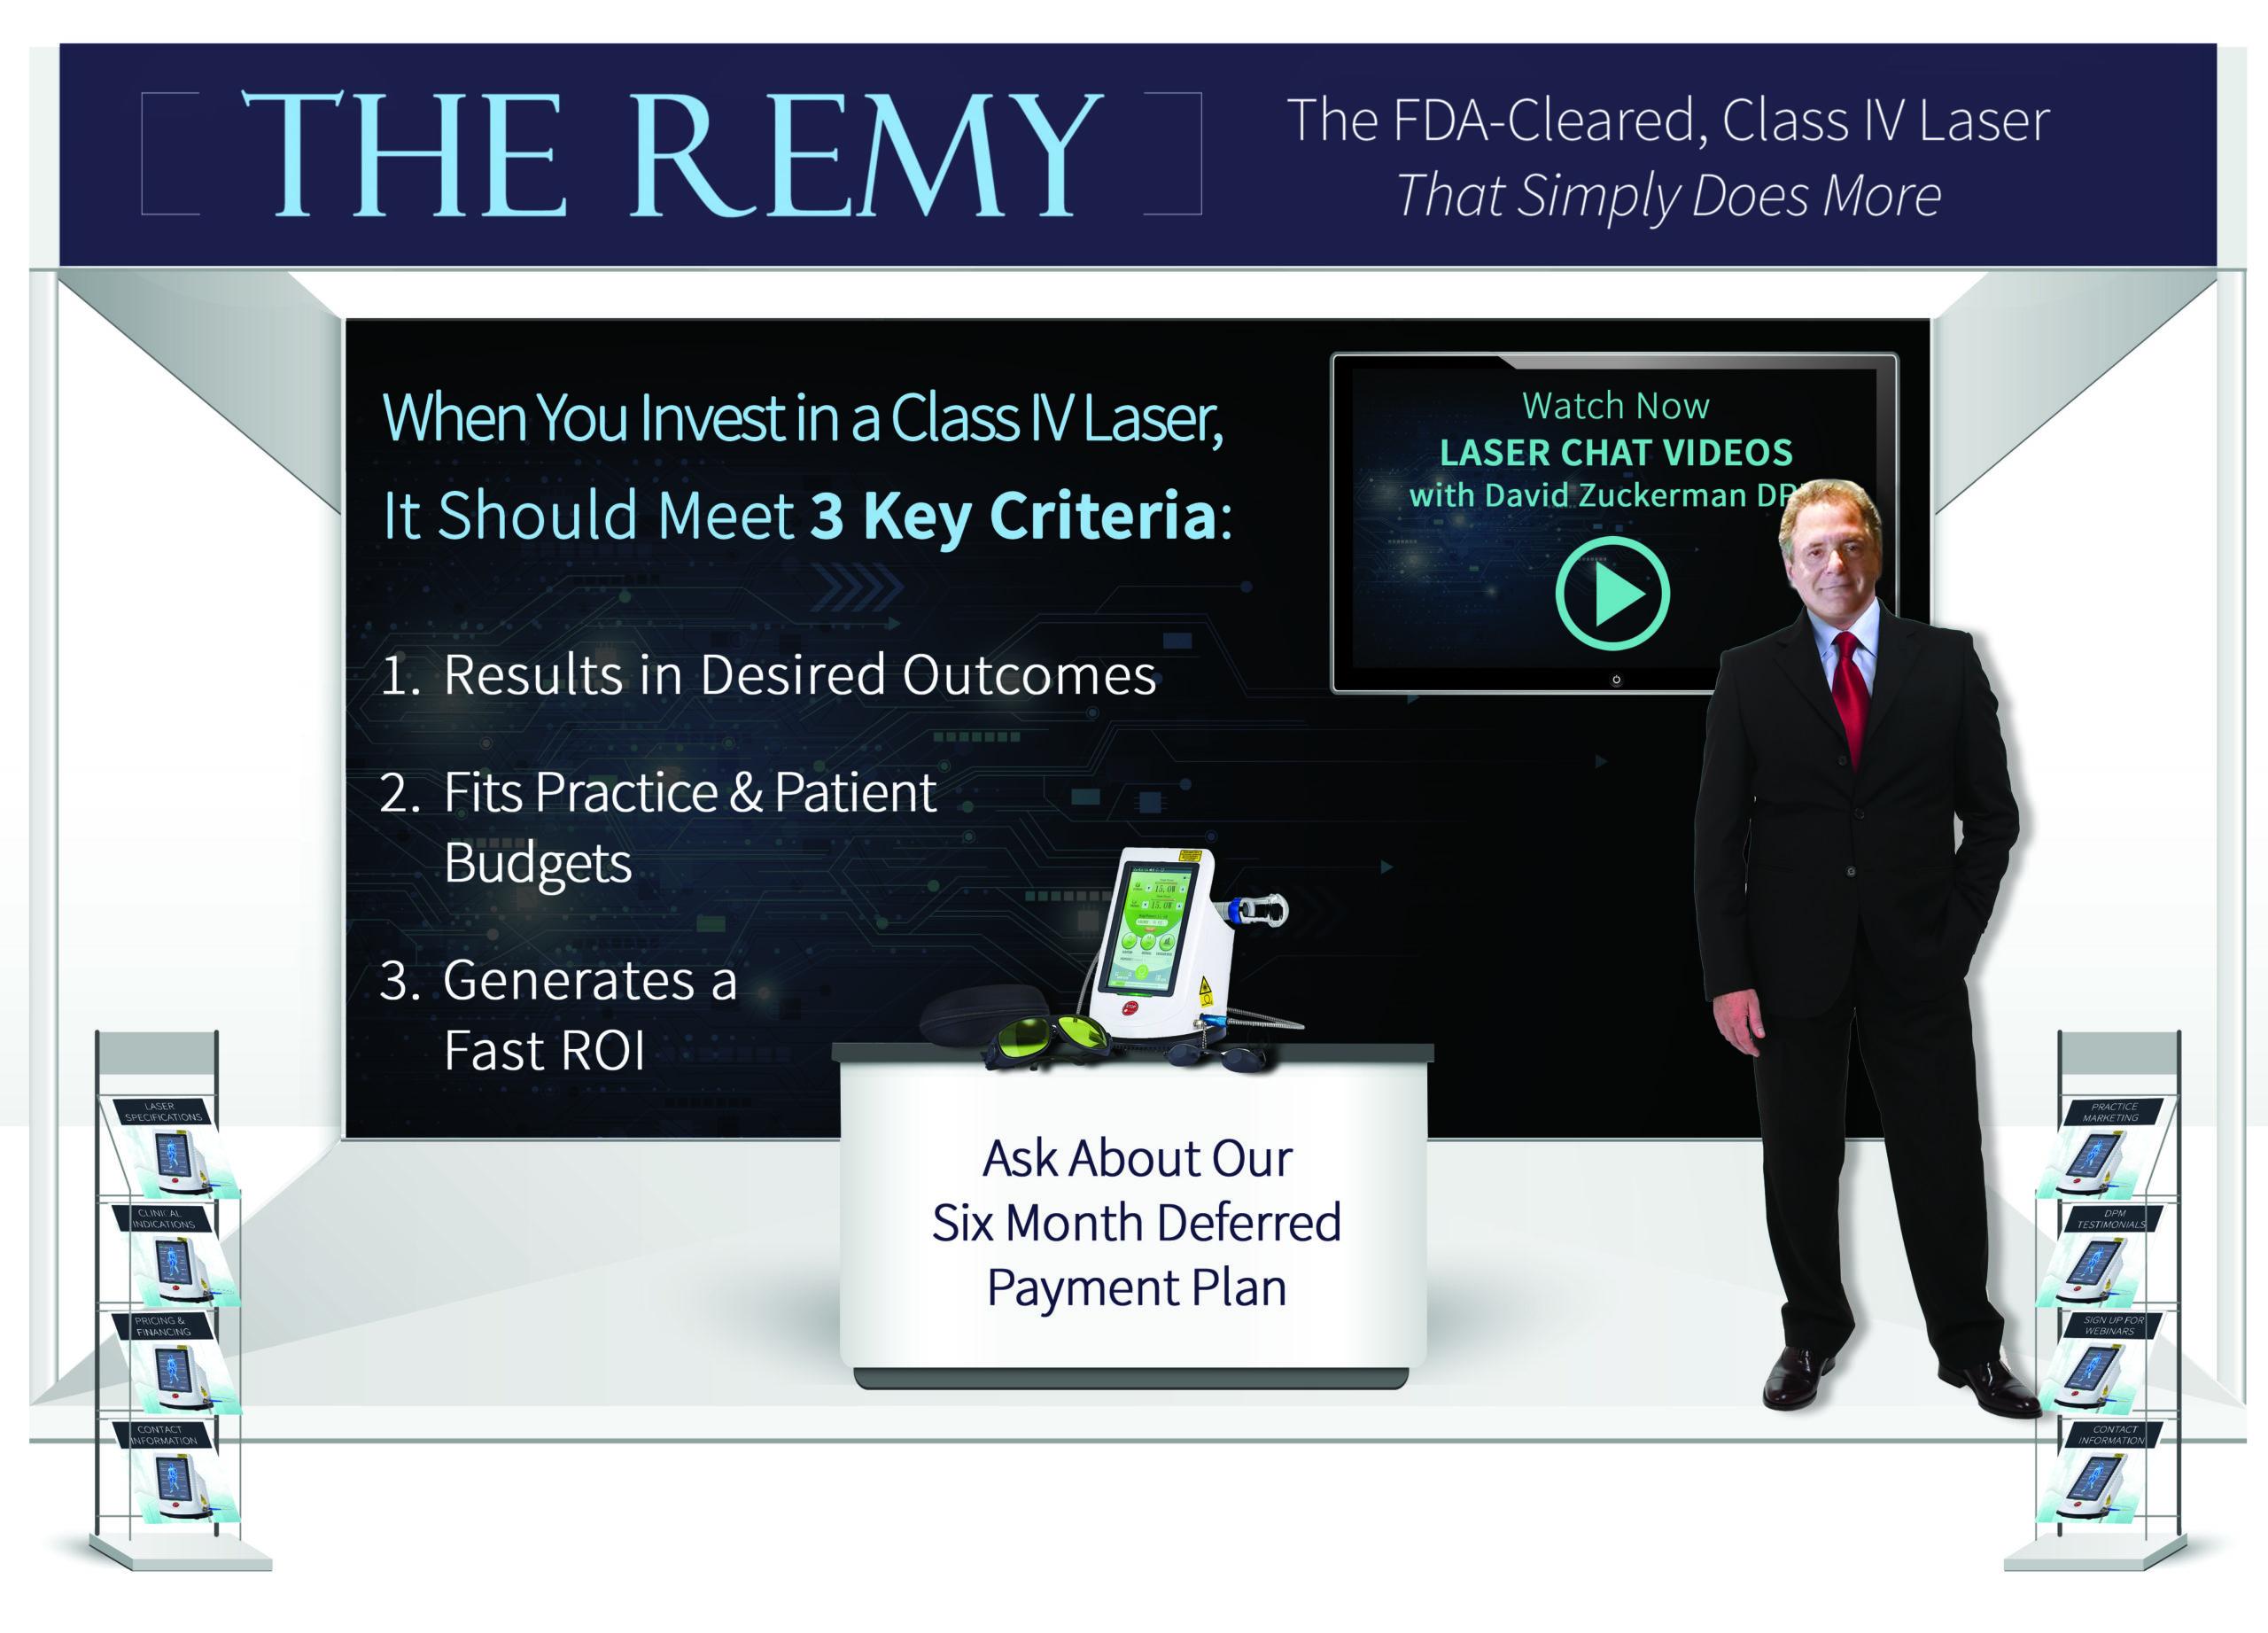 REMY CLASS IV LASER